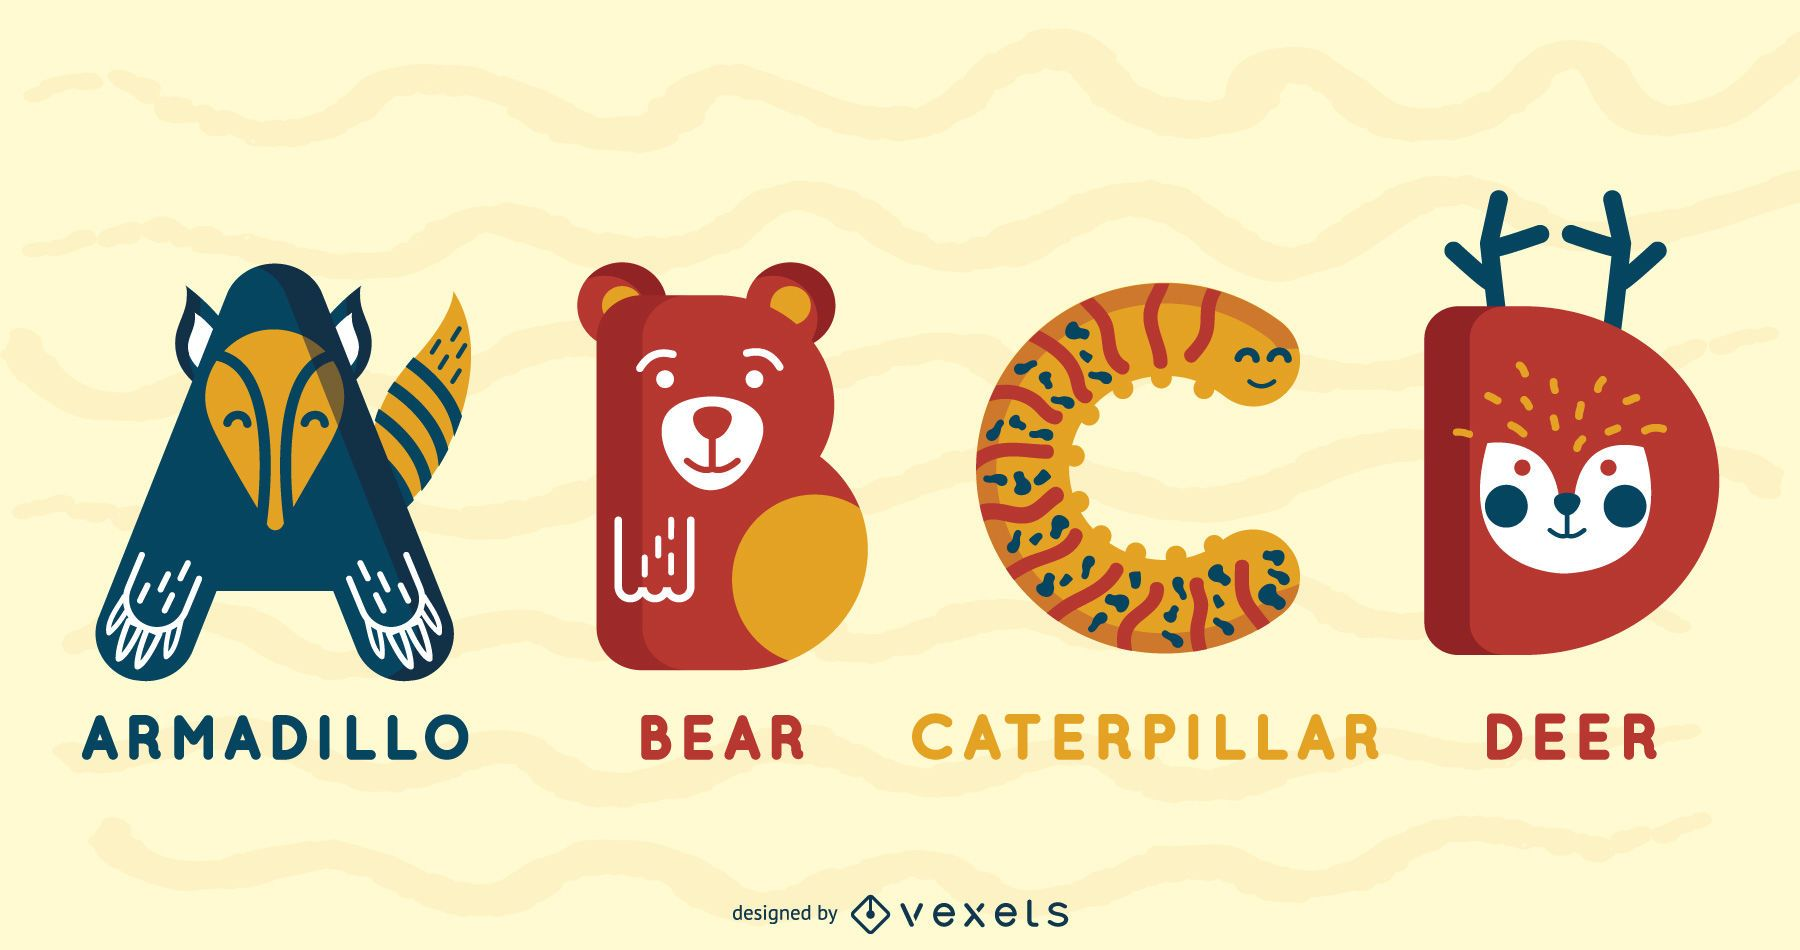 Paquete Ilustrado Alfabeto Animal ABCD